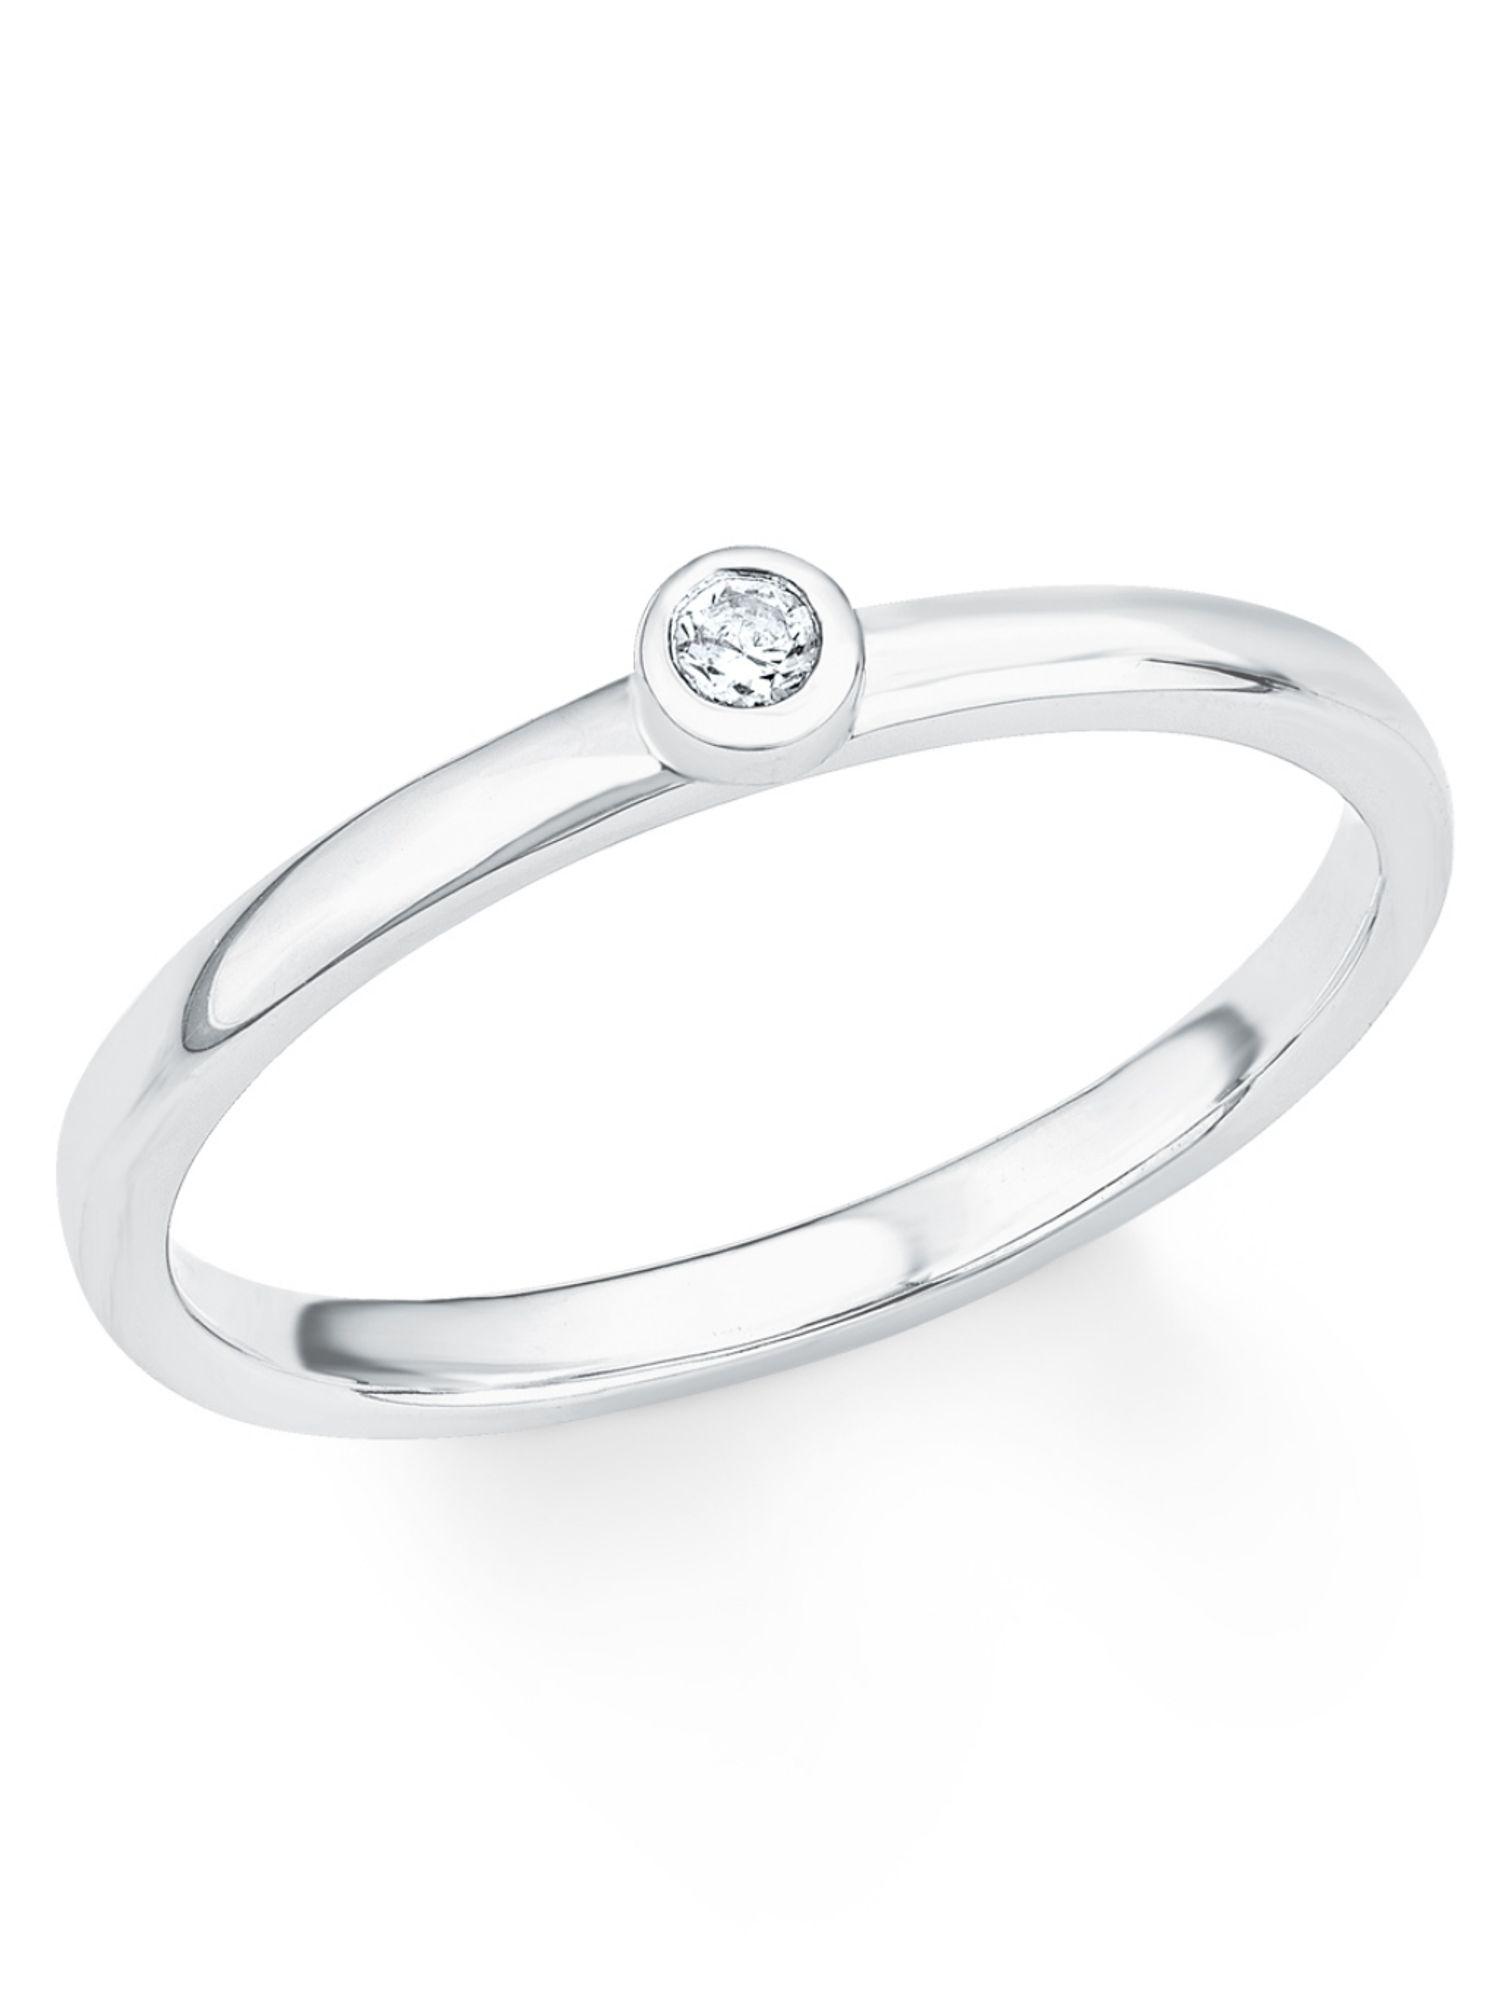 2022727 s.Oliver Damen Ring Sterling-Silber 925 Silber Weiß Zirkonia 56 17.8